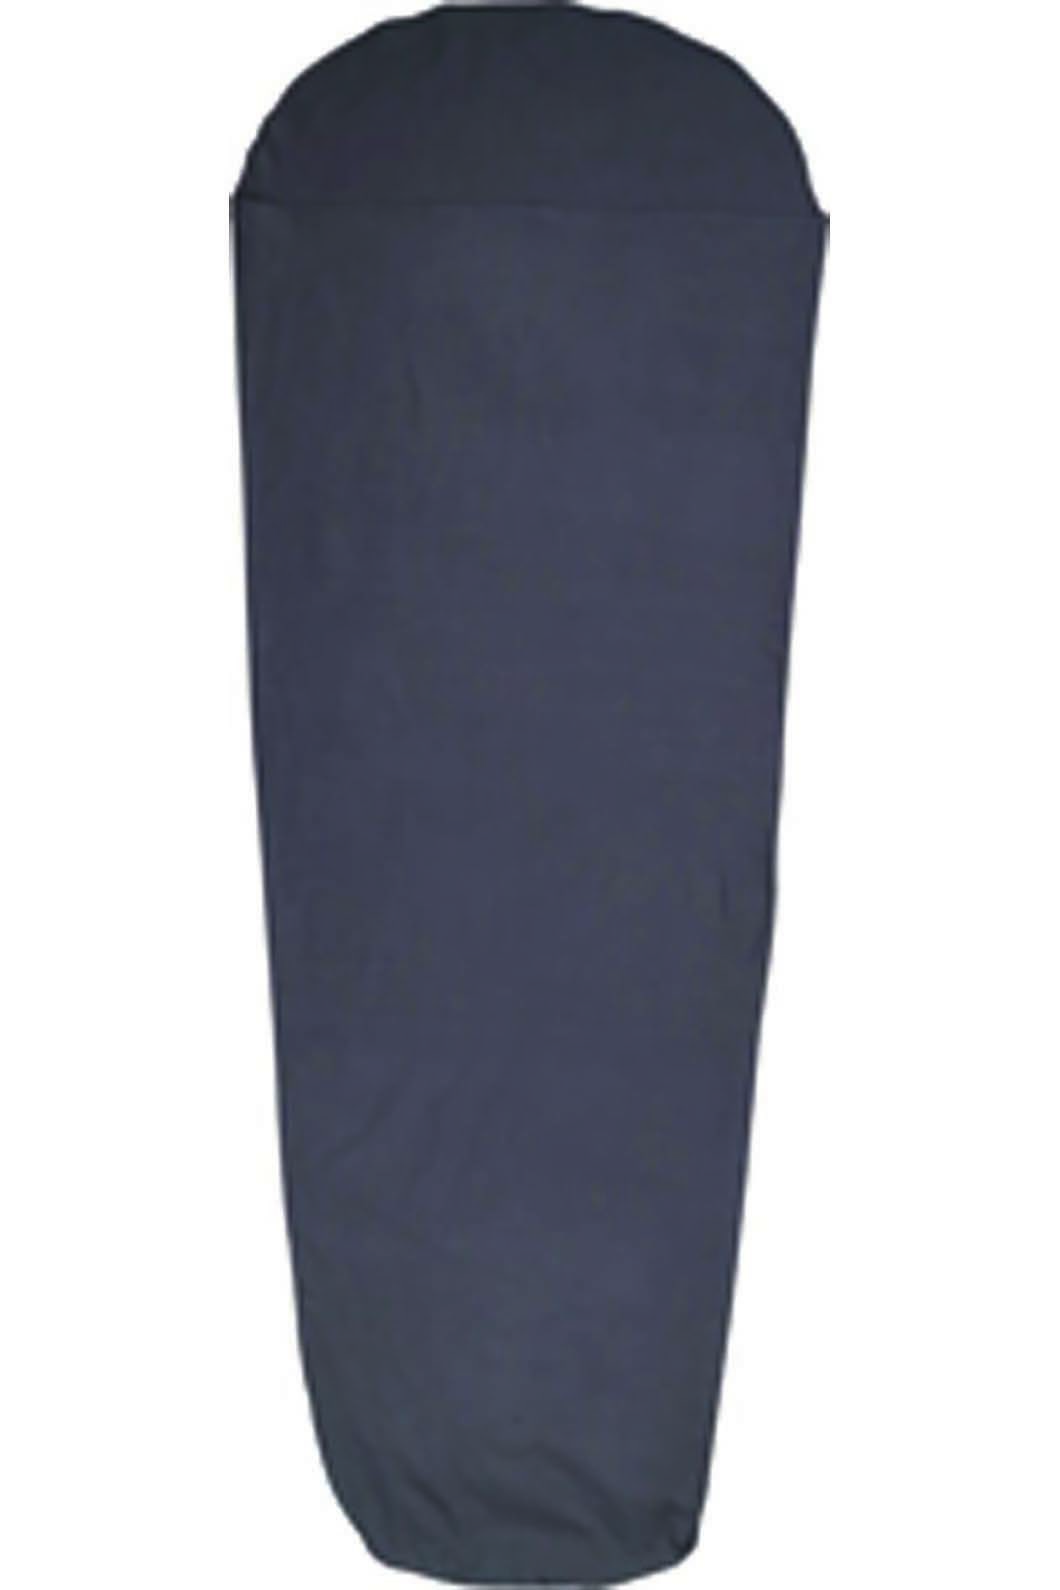 Outrak Flannel Sleeping Bag Liner, None, hi-res